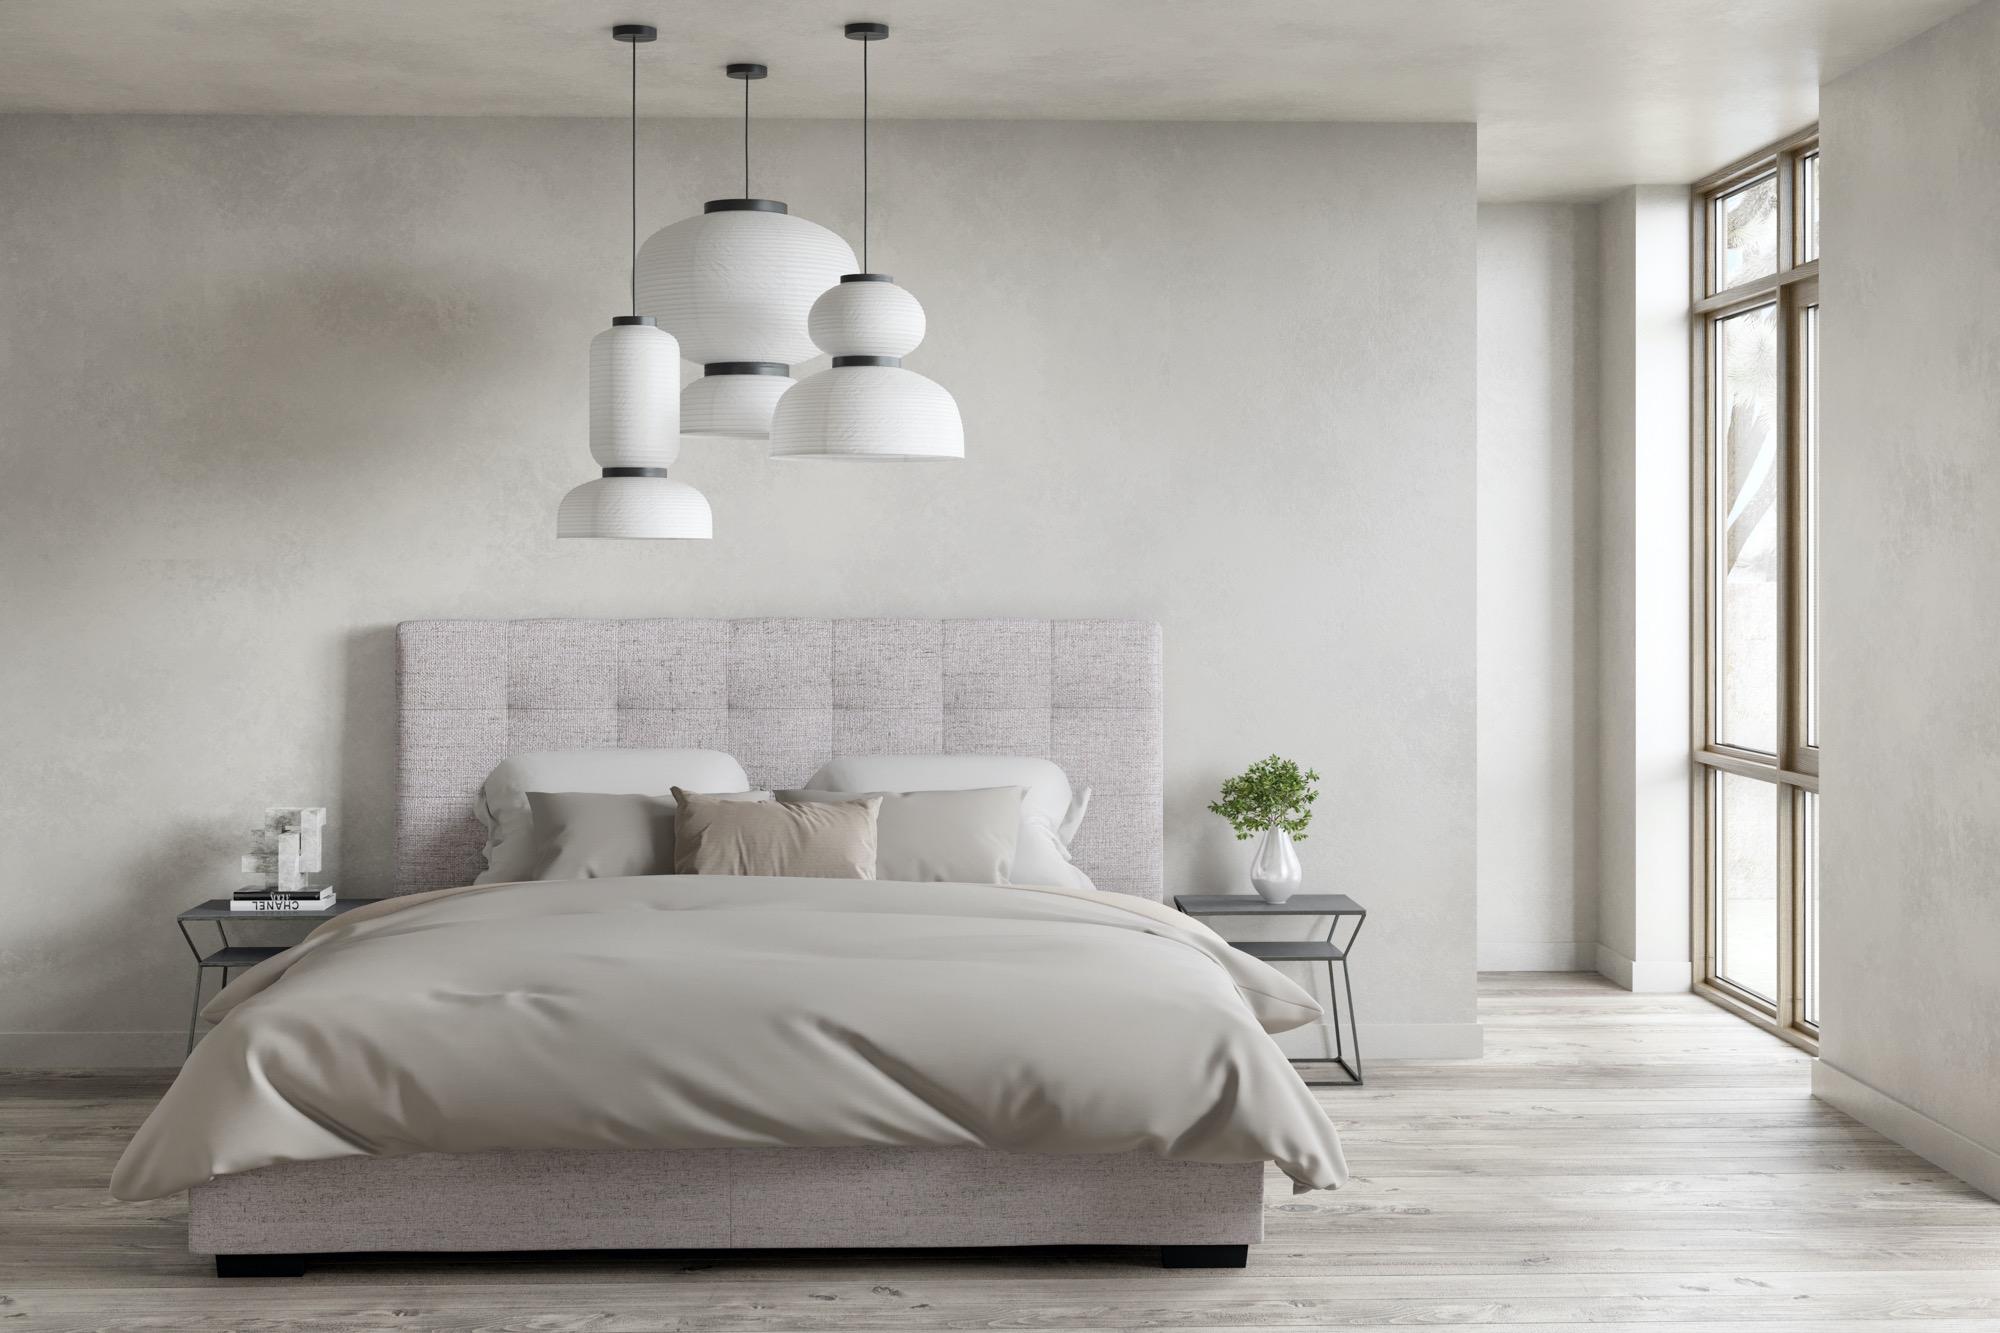 Belle grey storage bed in well-lit modern bedroom